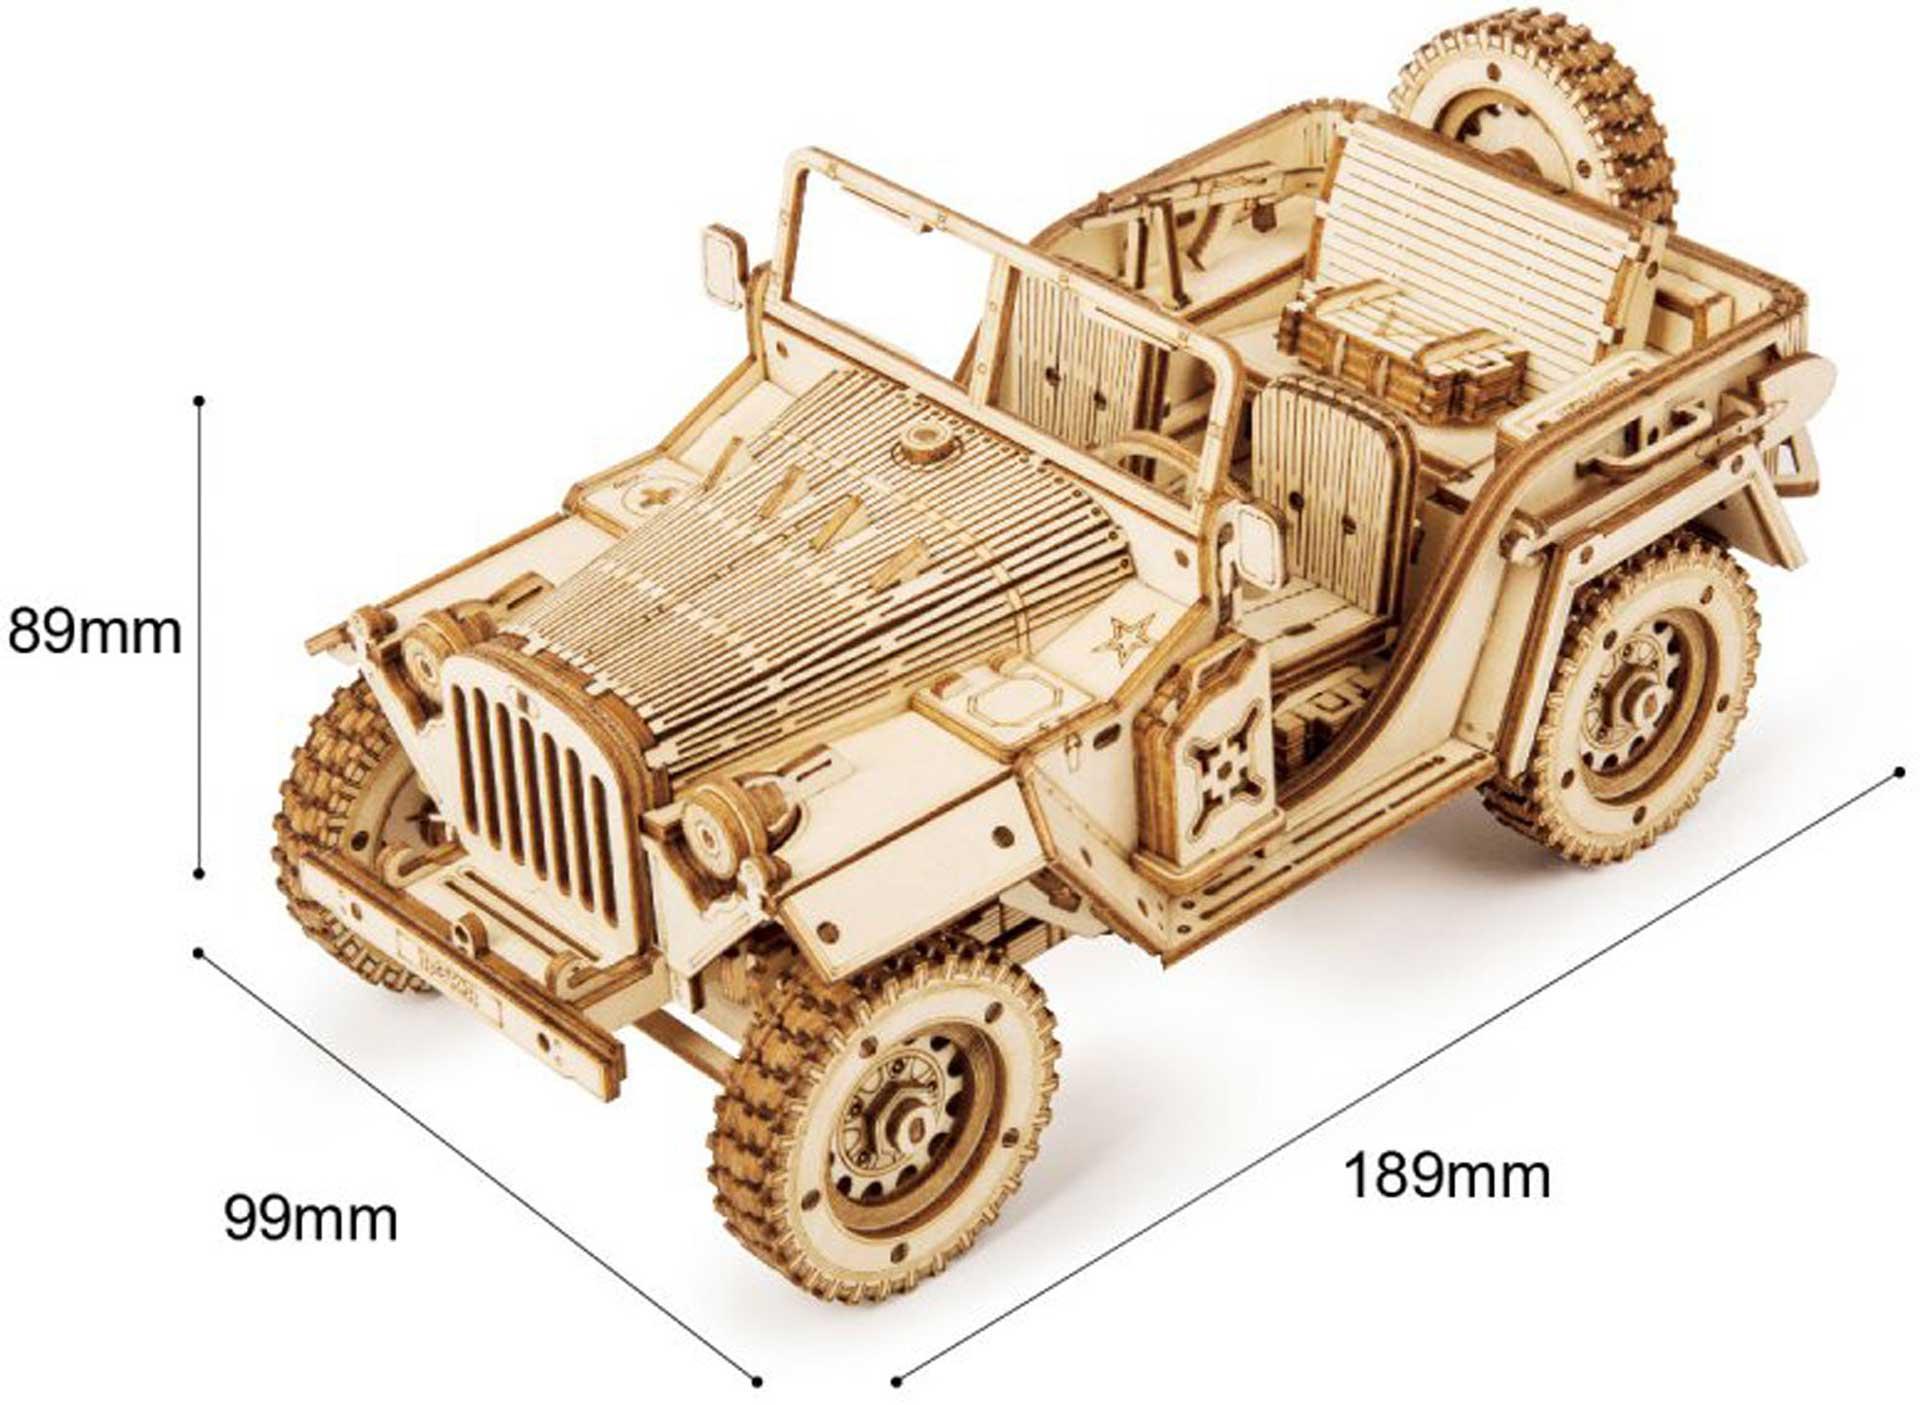 PICHLER Army Jeep (Lasercut Holzbausatz)